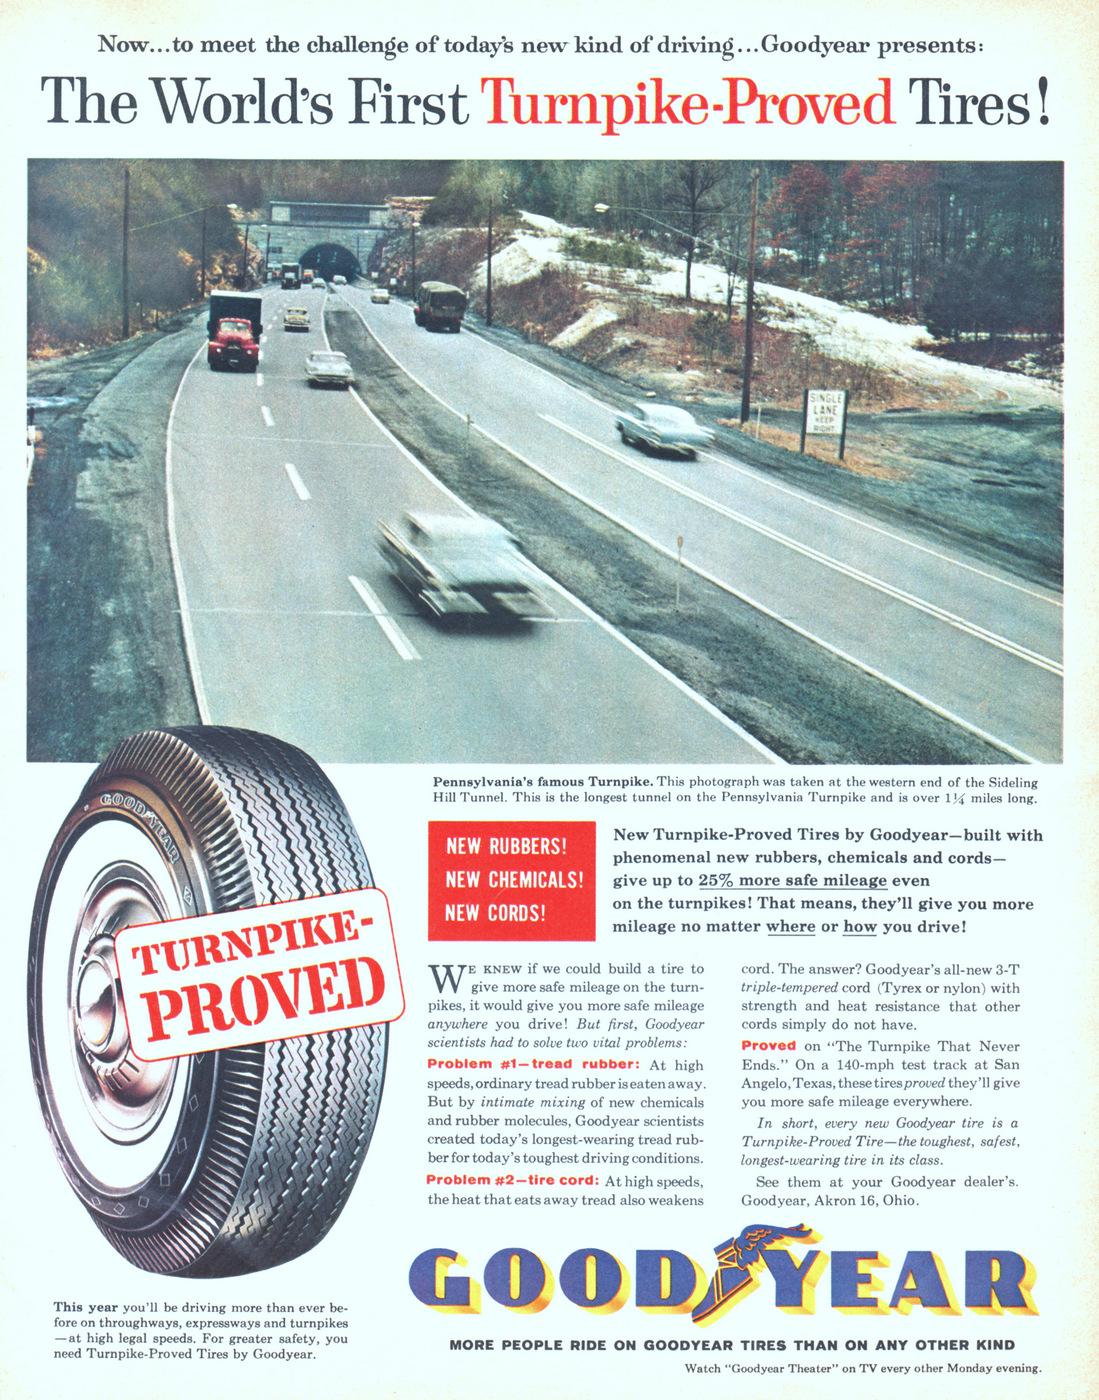 goodyear-tires-pennsylvania-turnpike-1.jpg